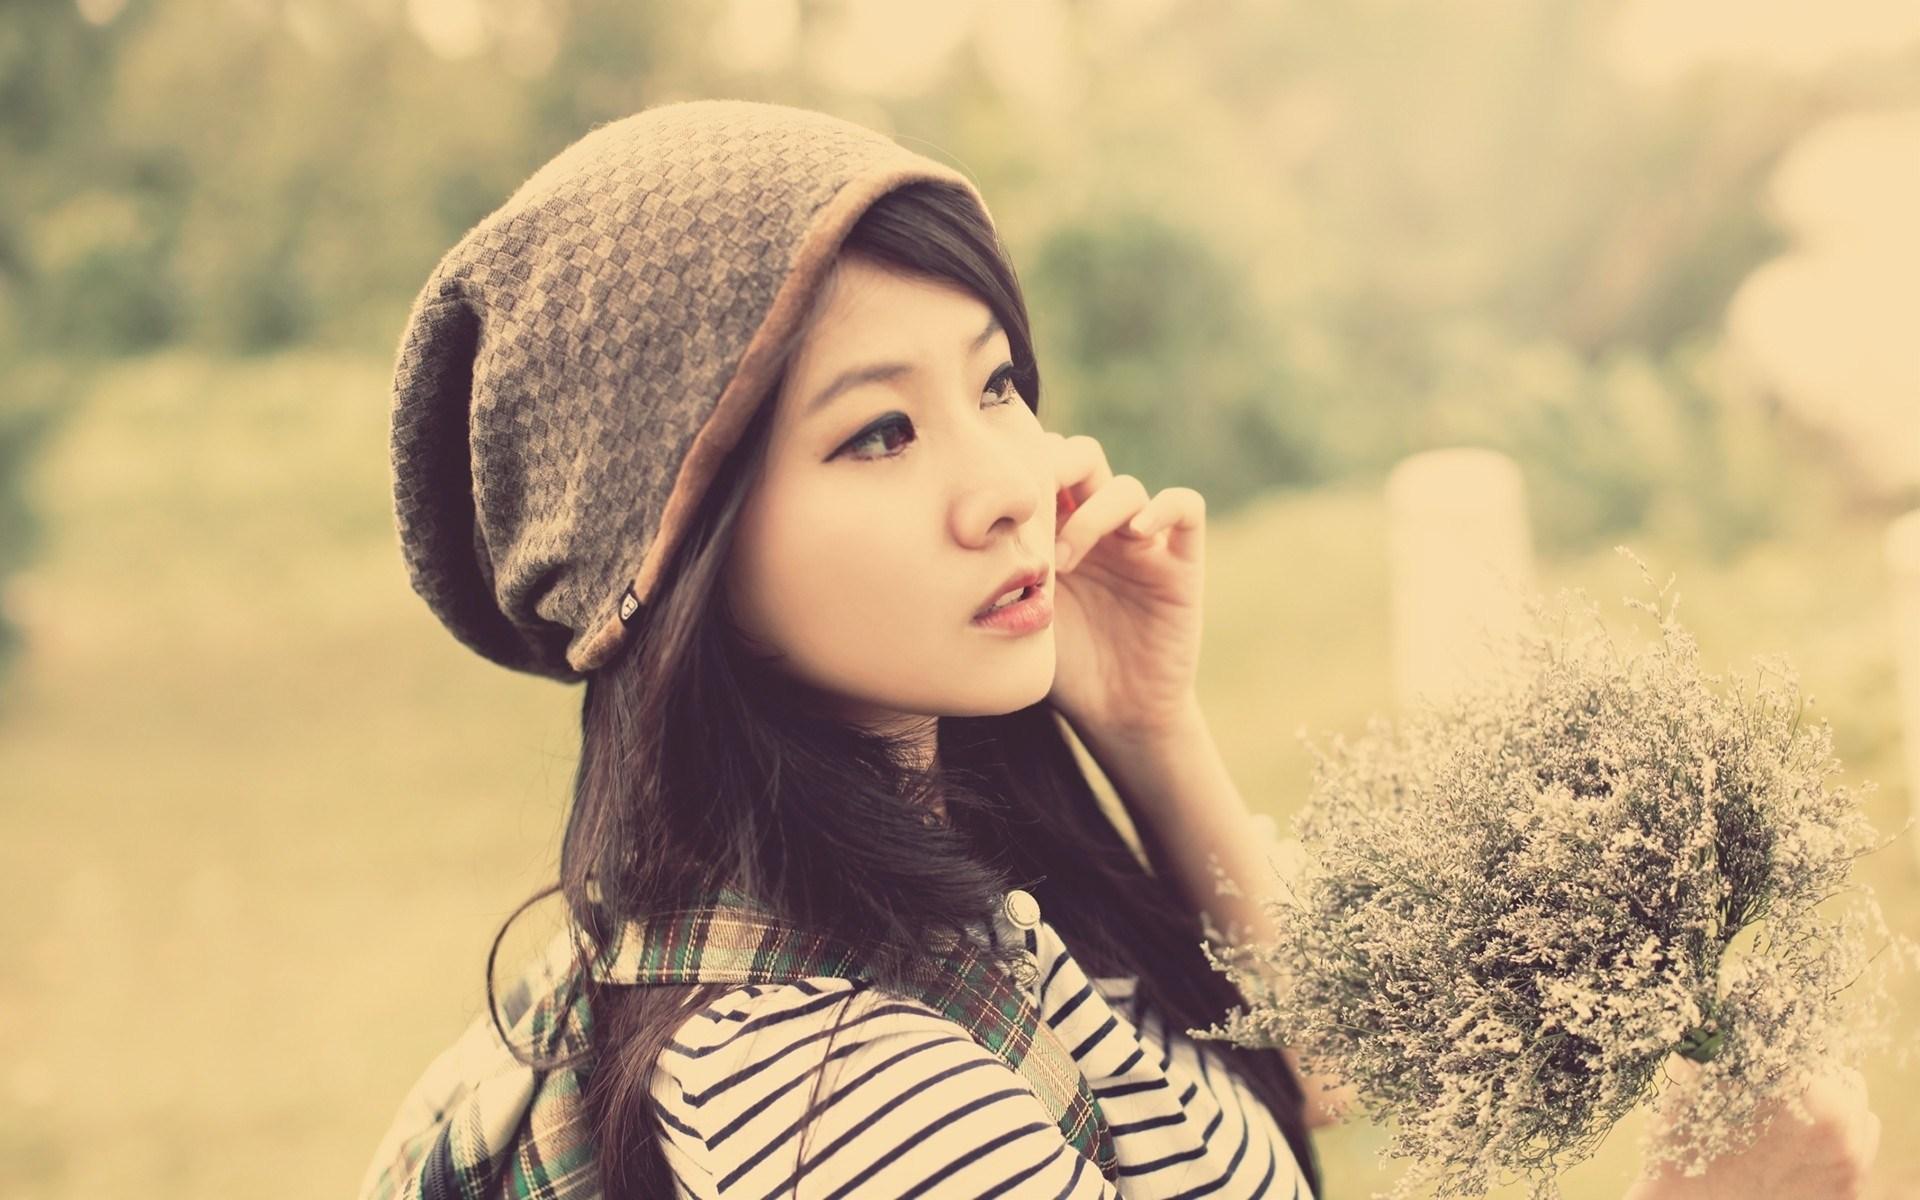 Cute Asian Girls Wallpapers